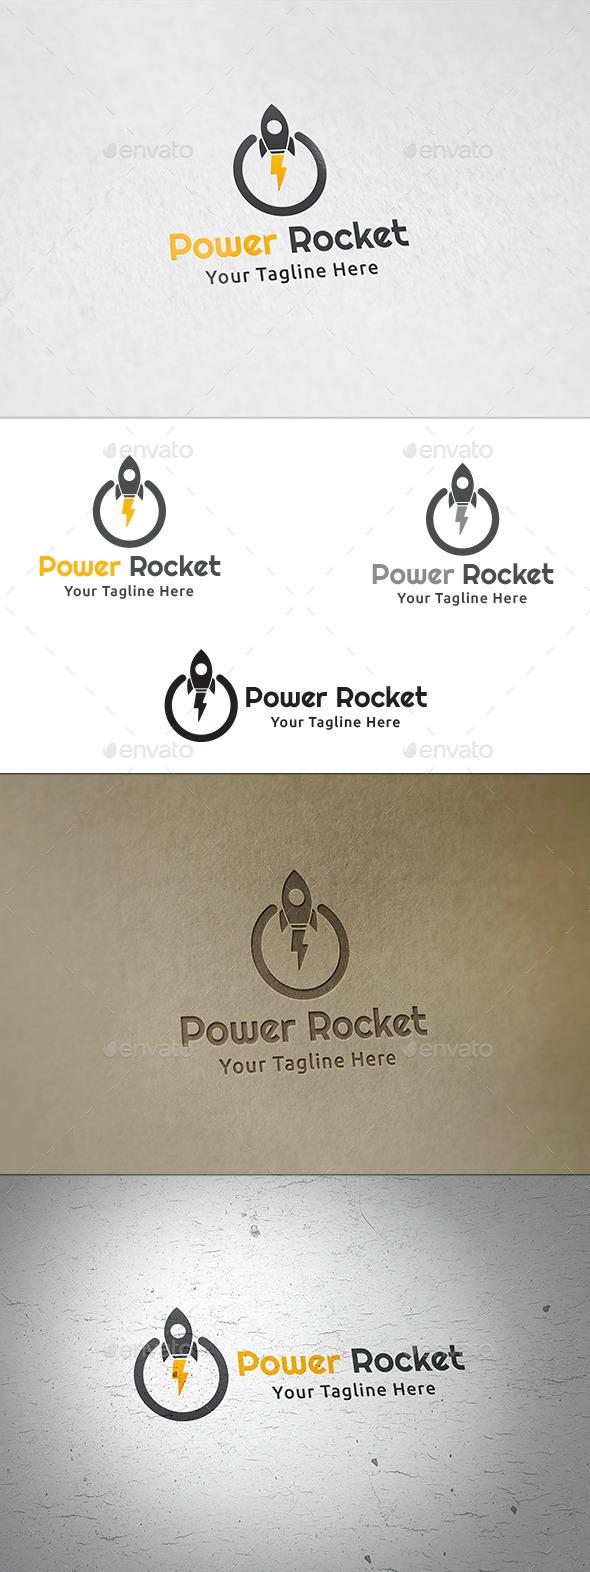 Power Rocket - Logo Template - Symbols Logo Templates